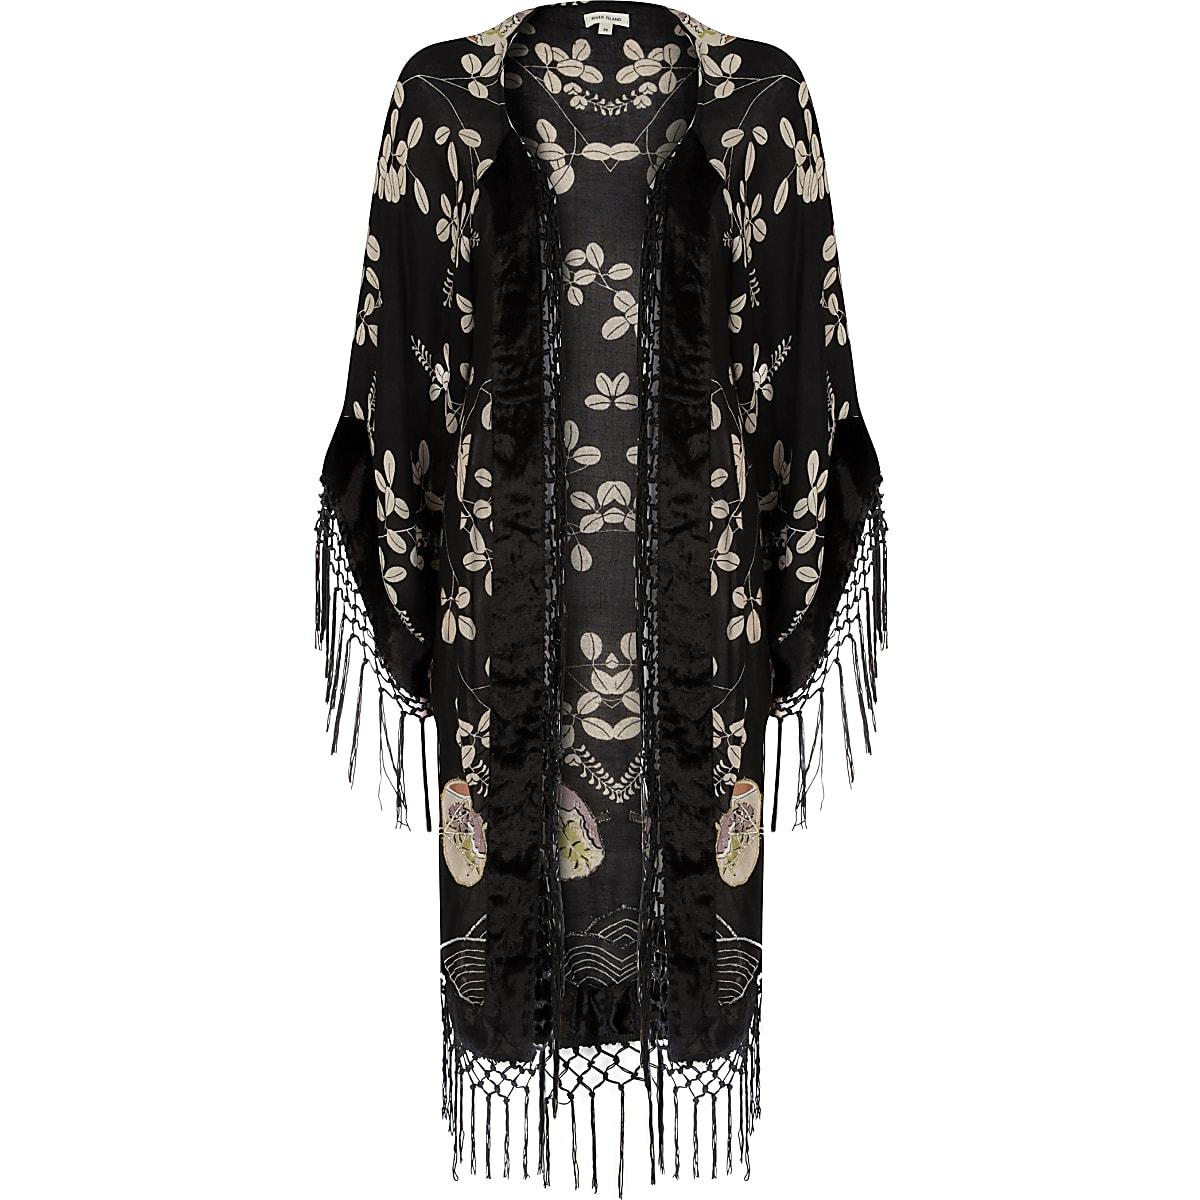 Black floral fringed longline kimono